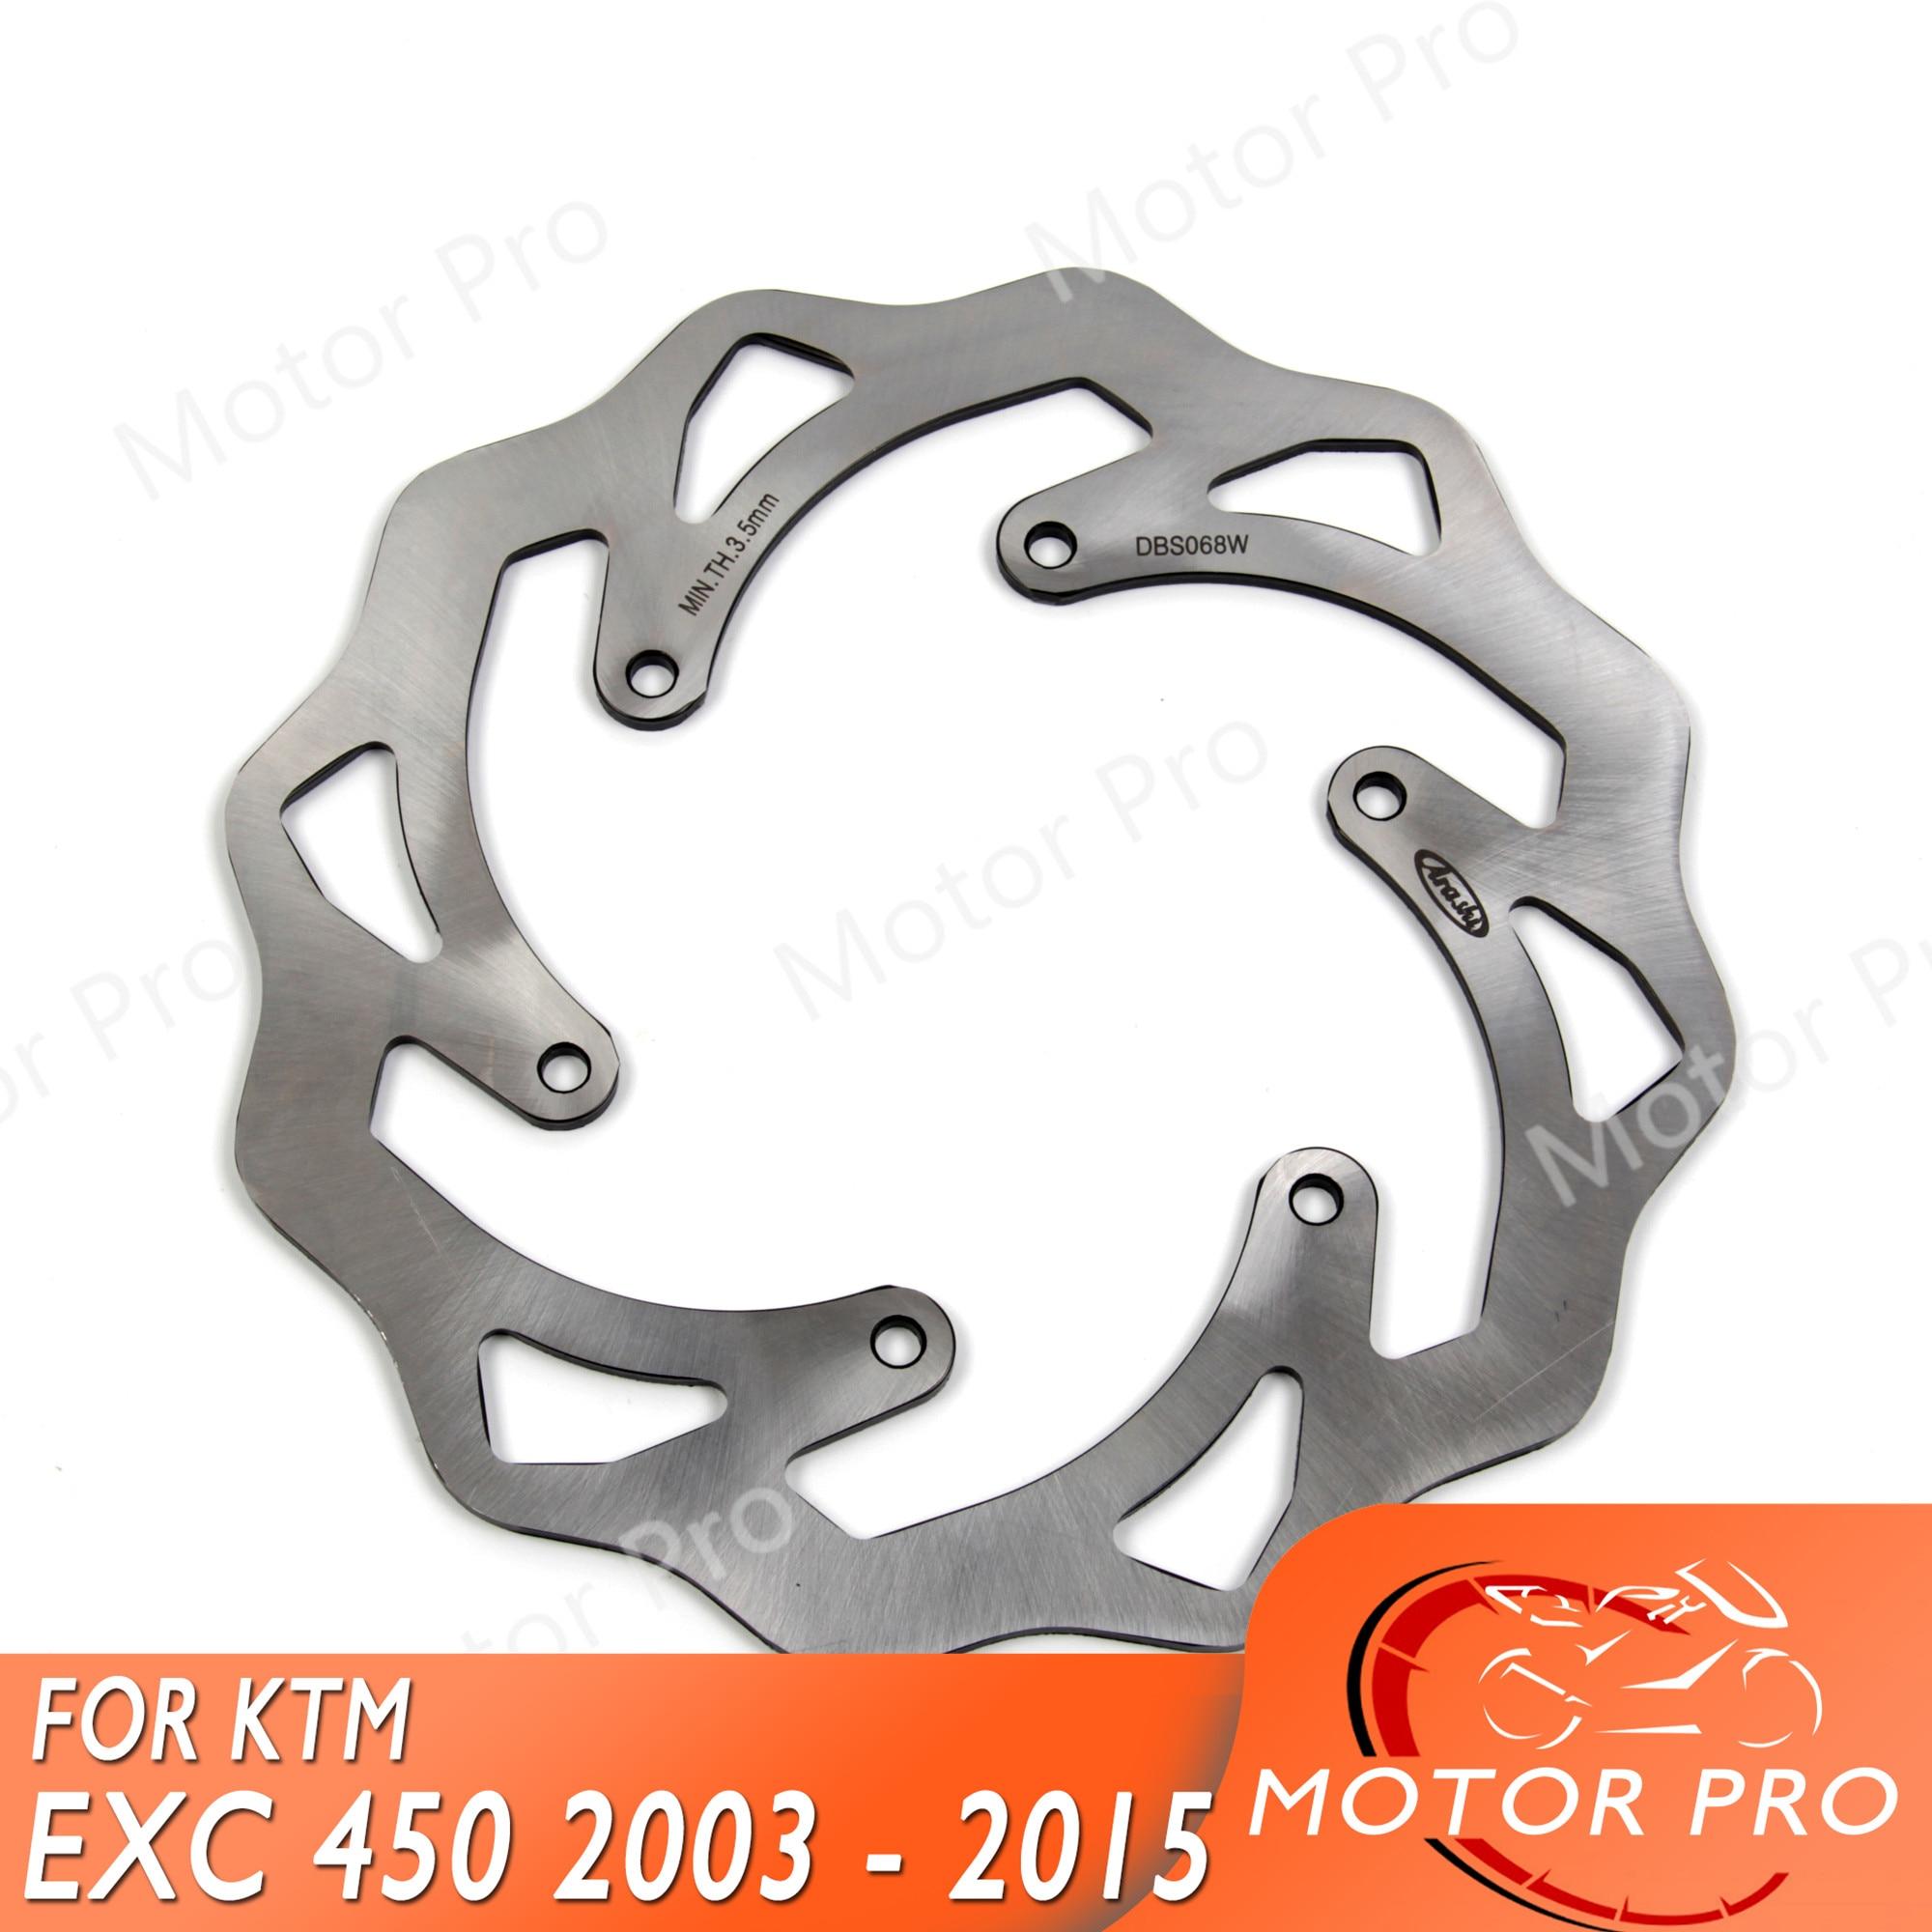 Front Brake Pads For KTM MXC450 Desert Racing 2004 2005 SX450 2003 2004 05 06